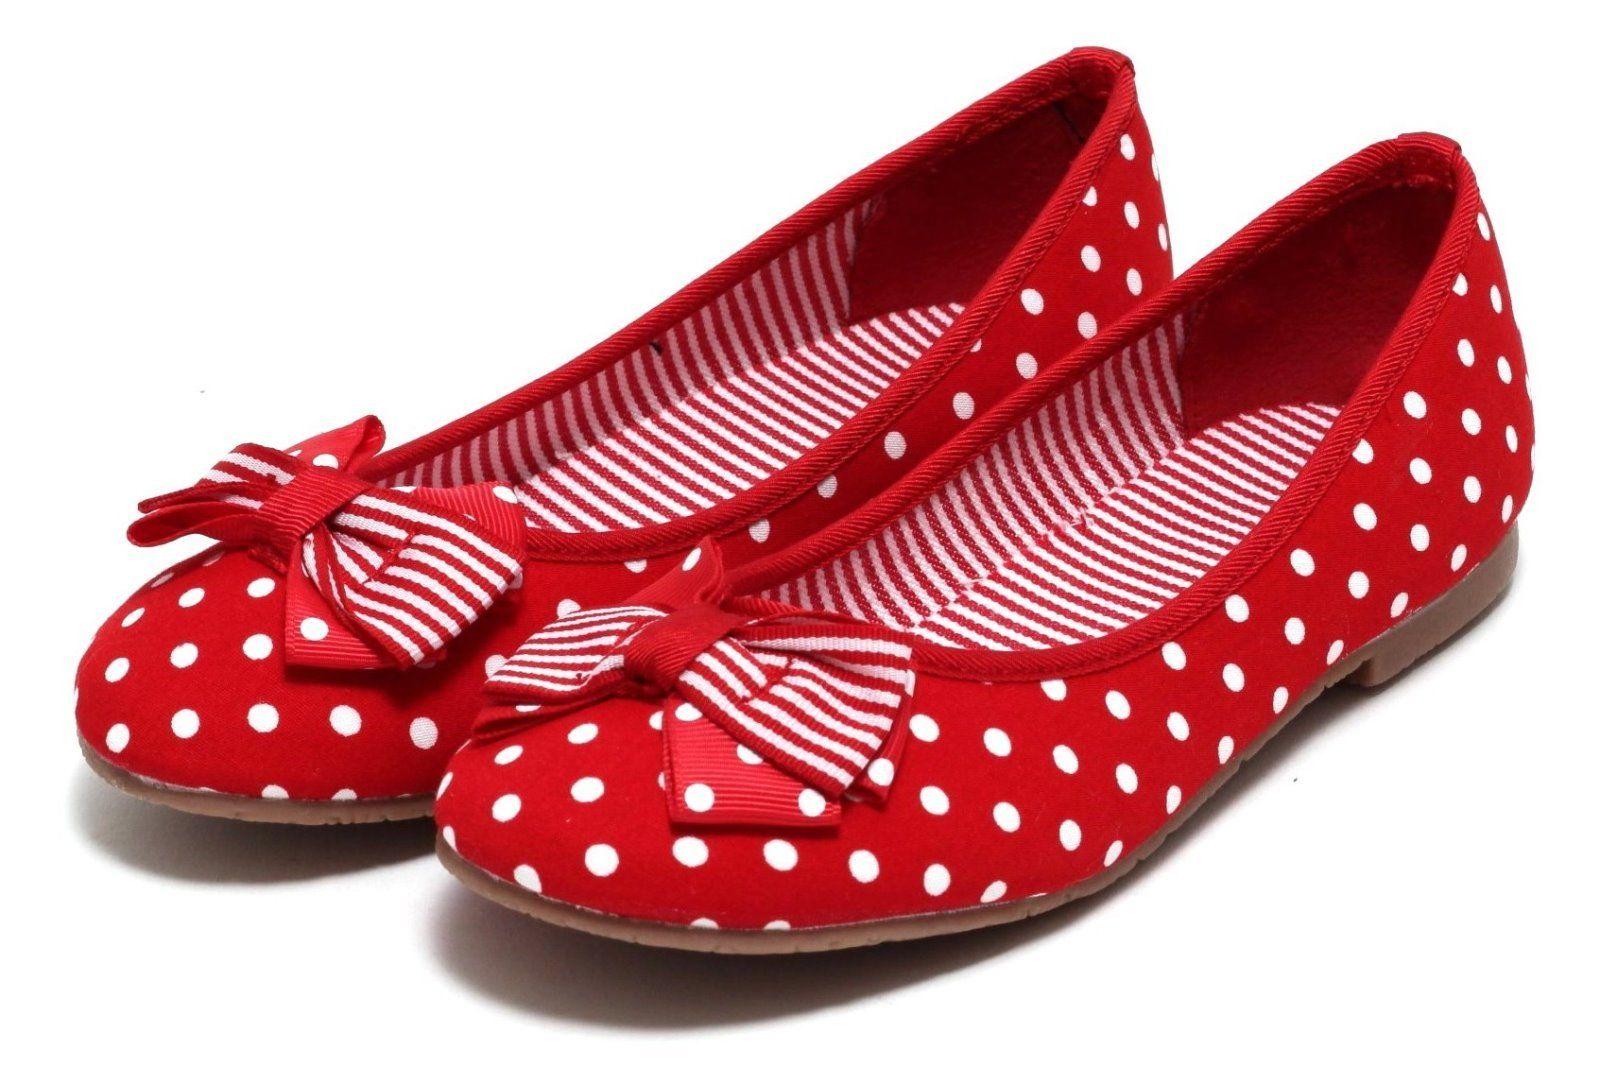 m dchen ballerina rockabilly sommerschuhe schuhe sandalen slipper punkte rot ebay. Black Bedroom Furniture Sets. Home Design Ideas